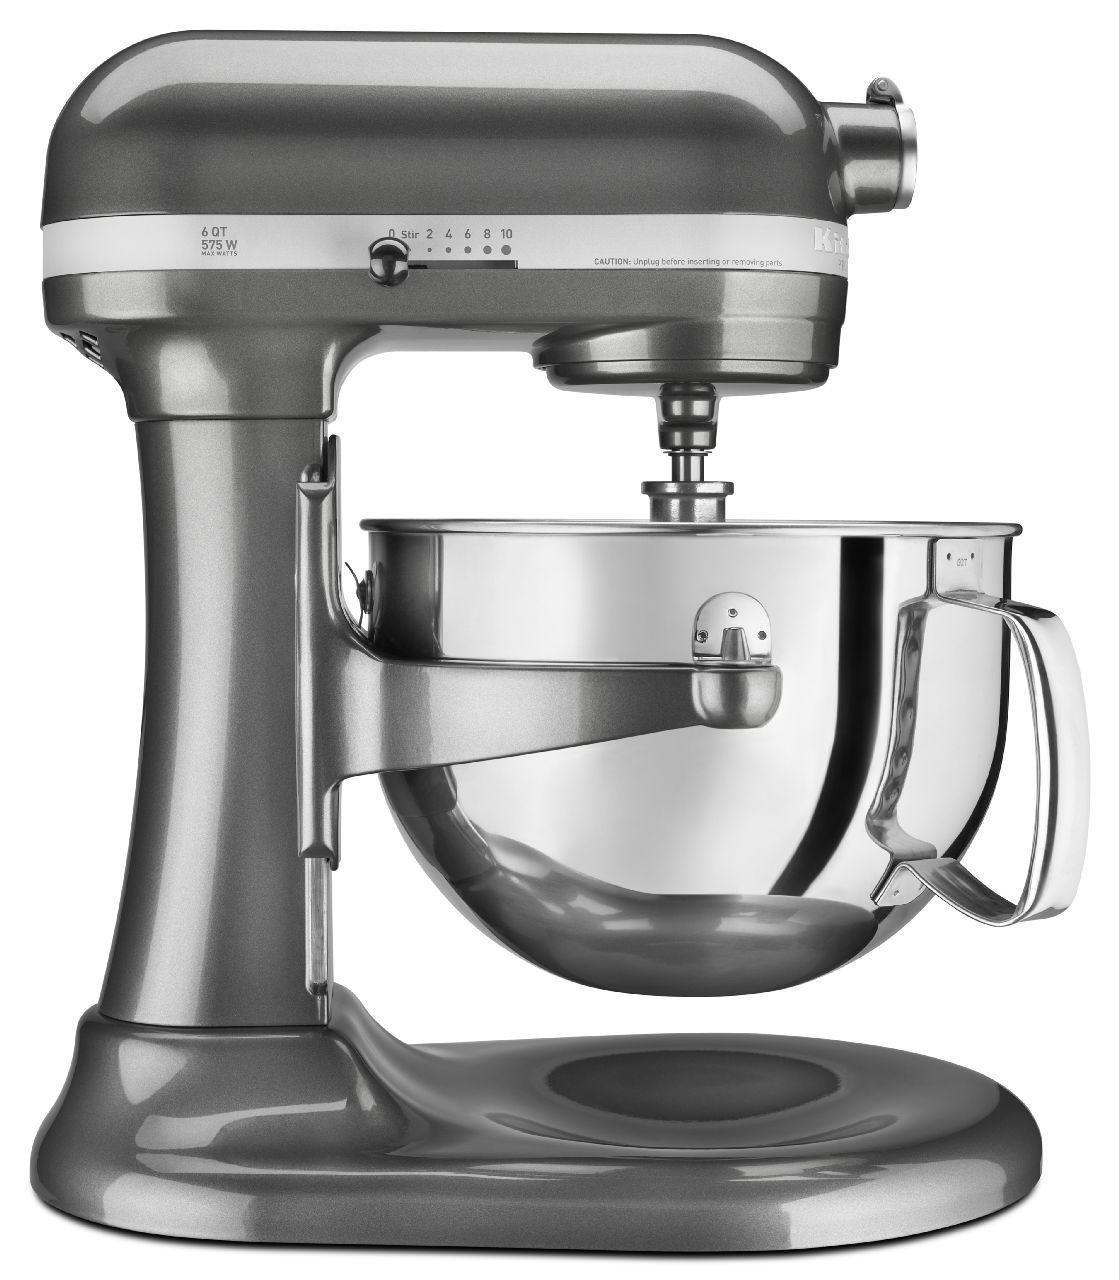 KitchenAid Professional 600 Series KP26M1XER Bowl-Lift Stand Mixer, 6 Quart, Liquid Graphite